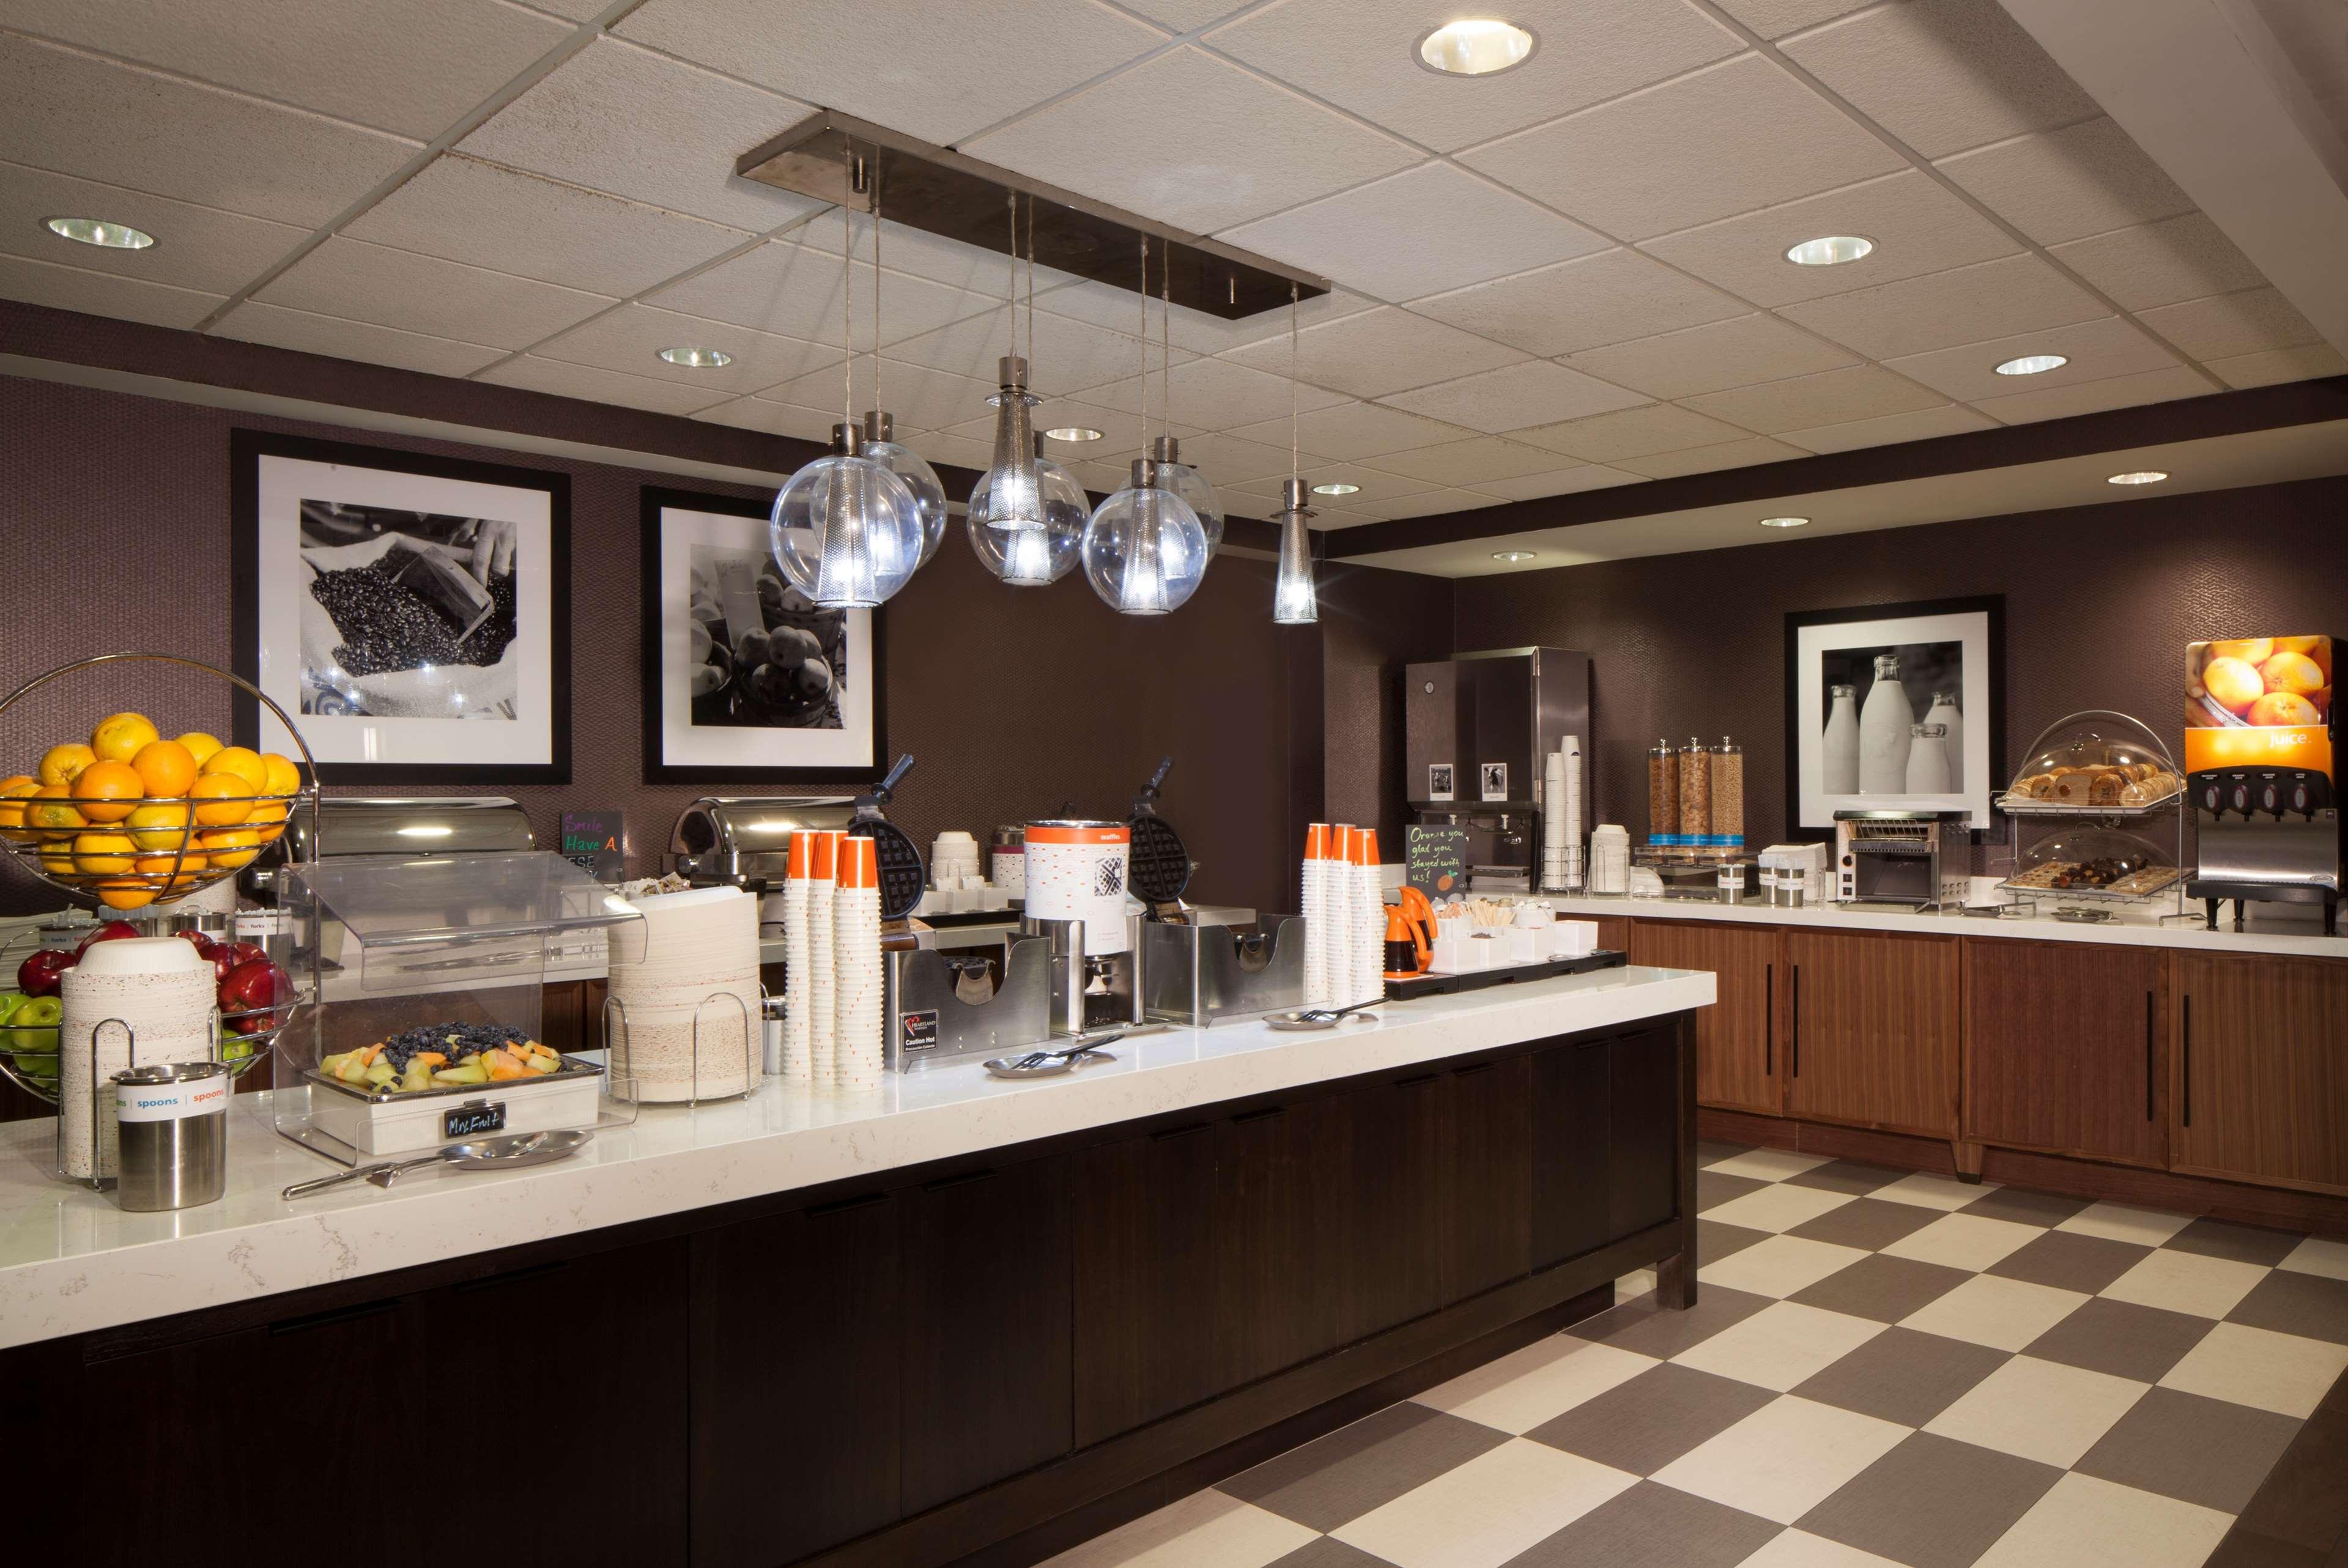 Hampton Inn & Suites Columbus-Easton Area image 14